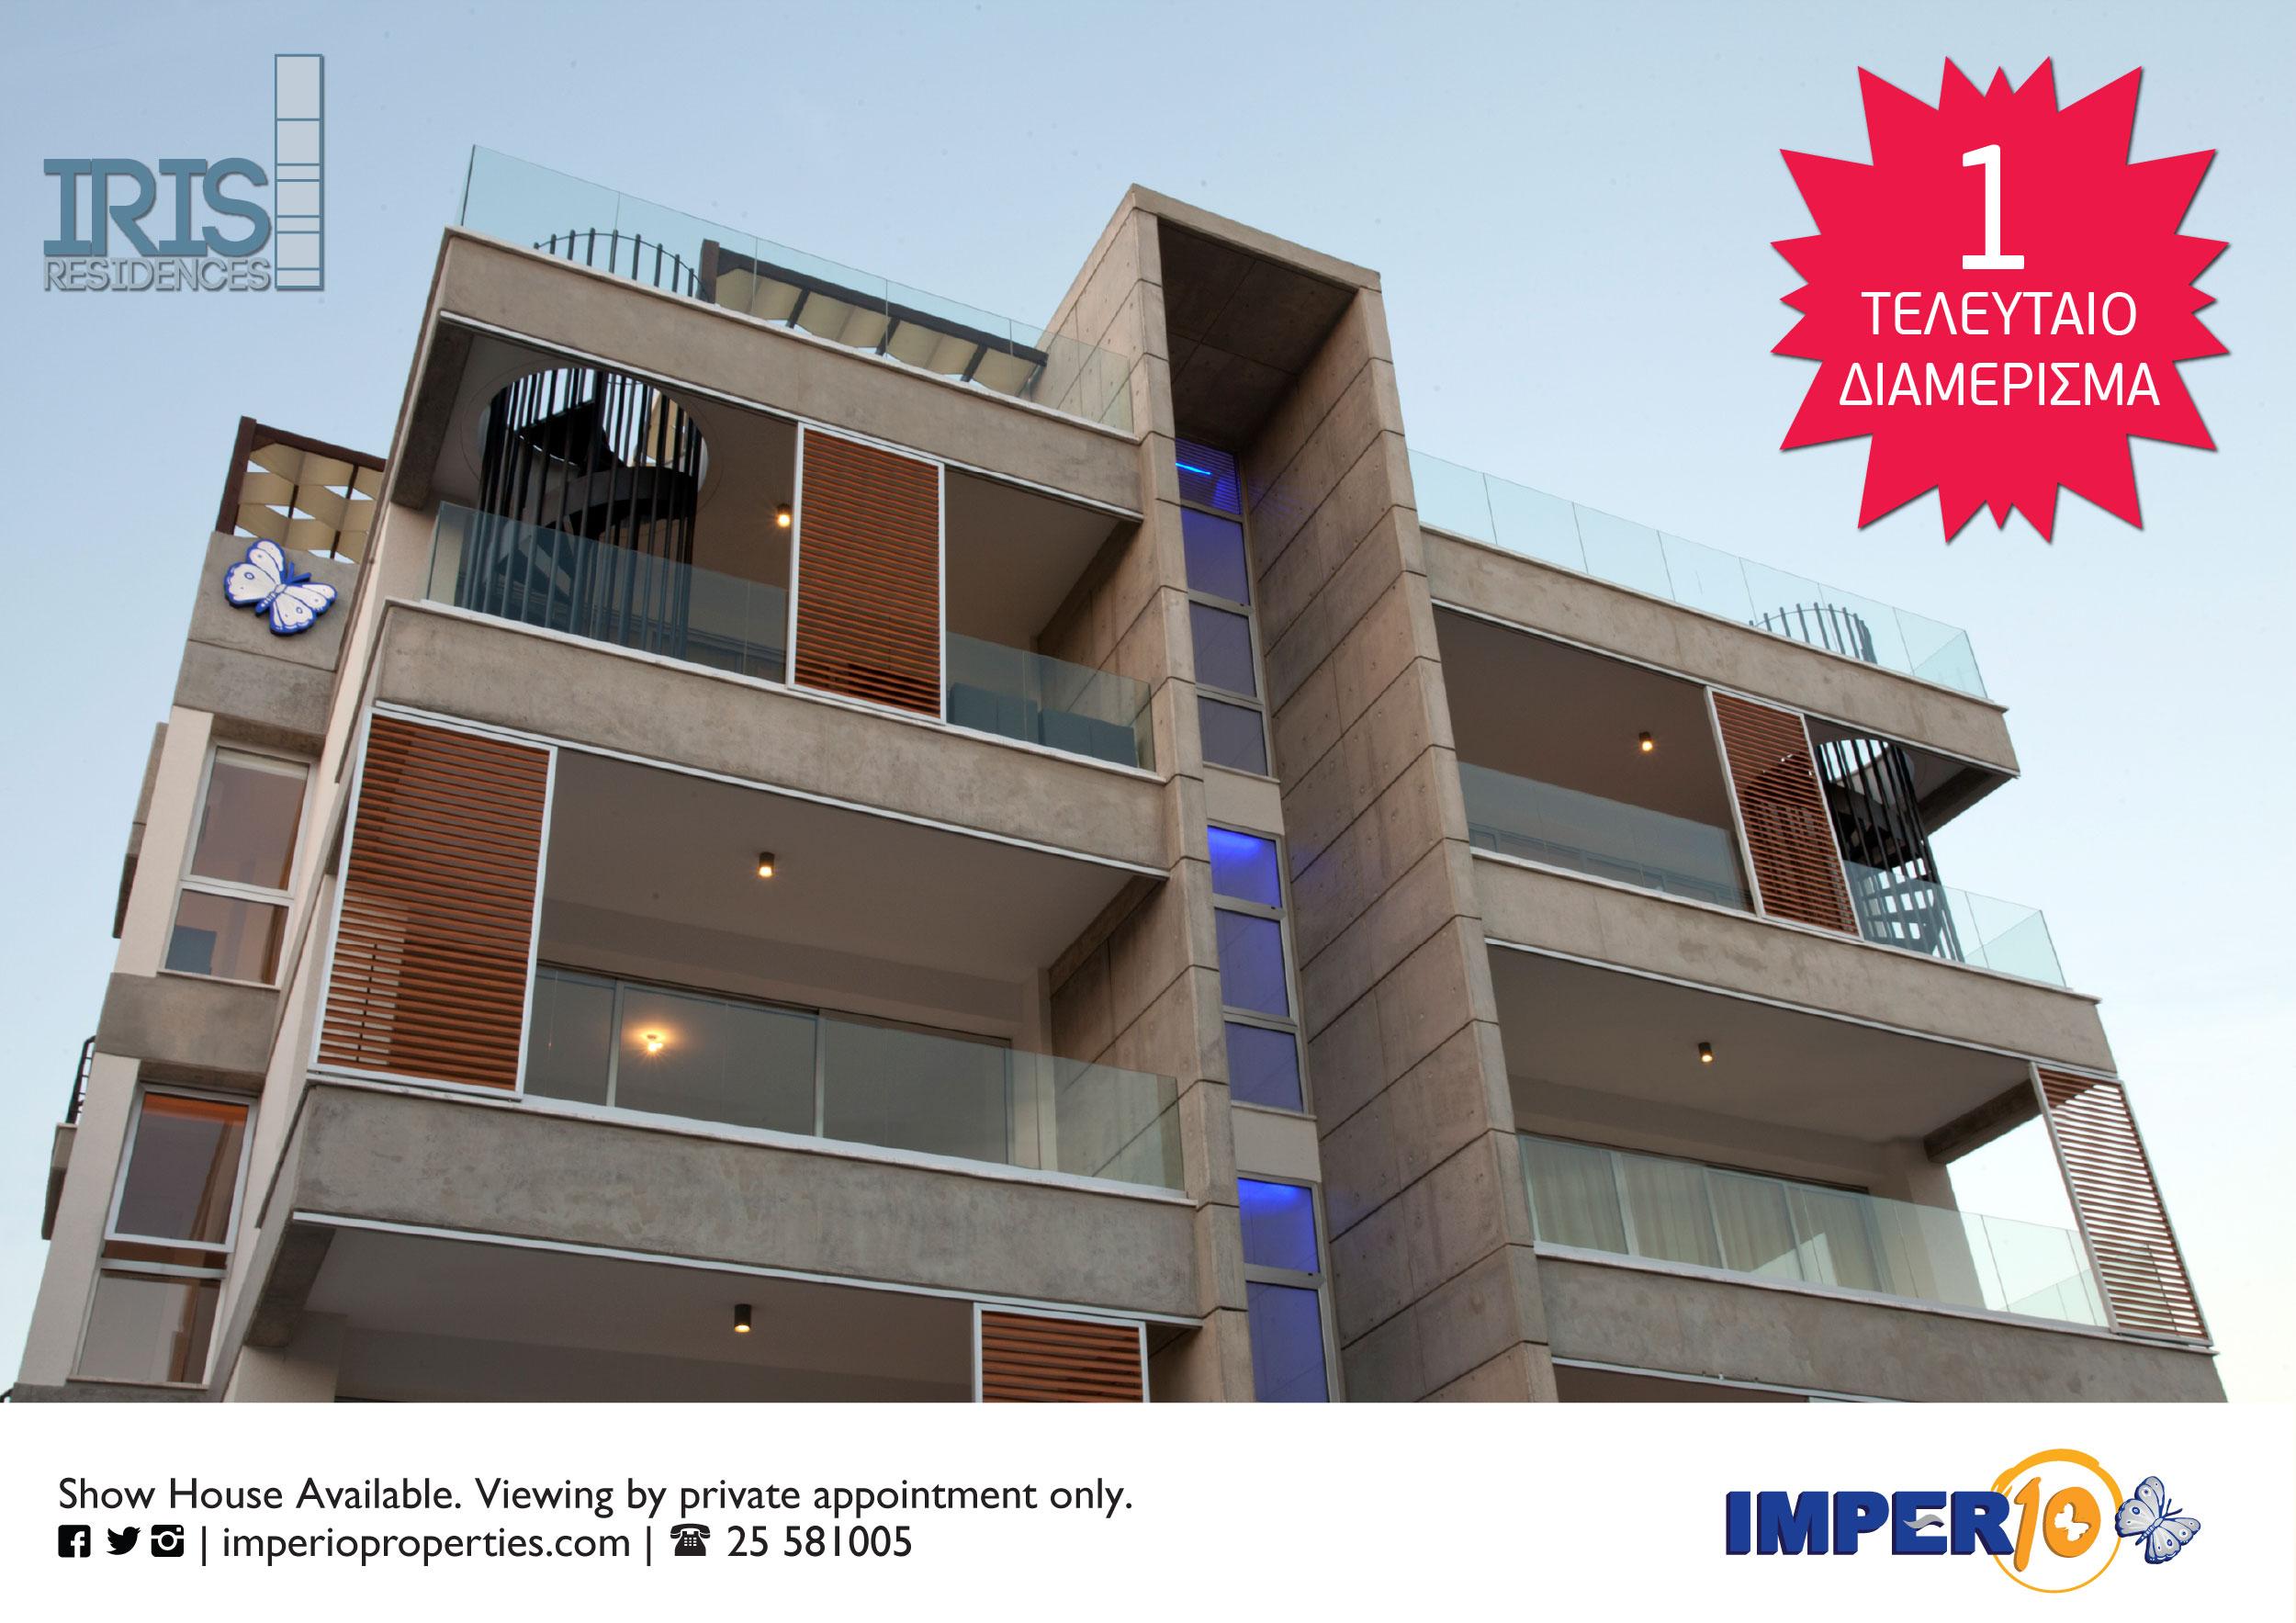 Iris Residences - 1 last apartment